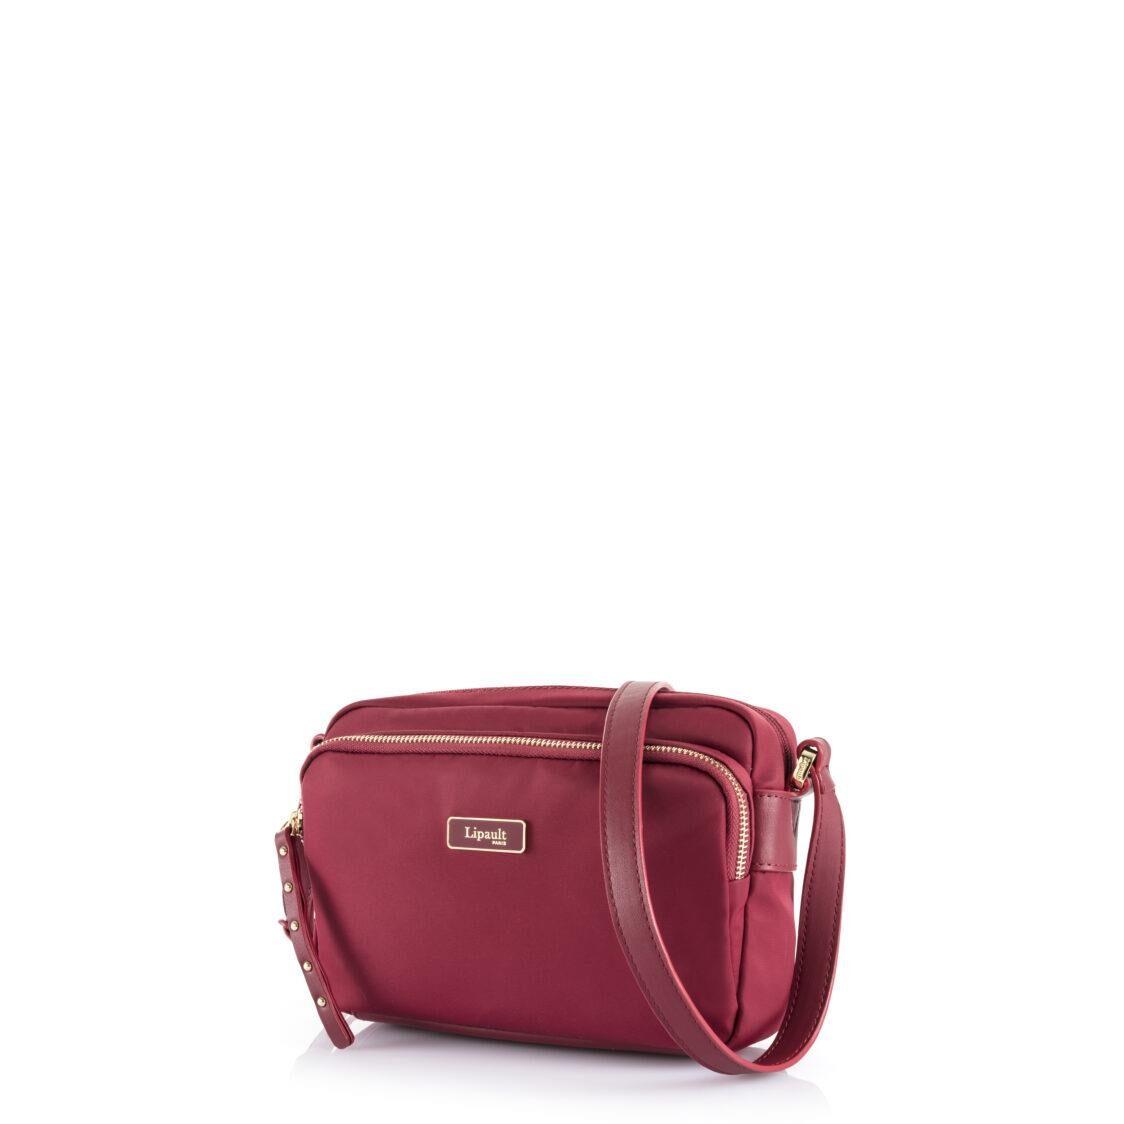 Lipault Paris Plume Essentials Crossbody Bag GQ450013